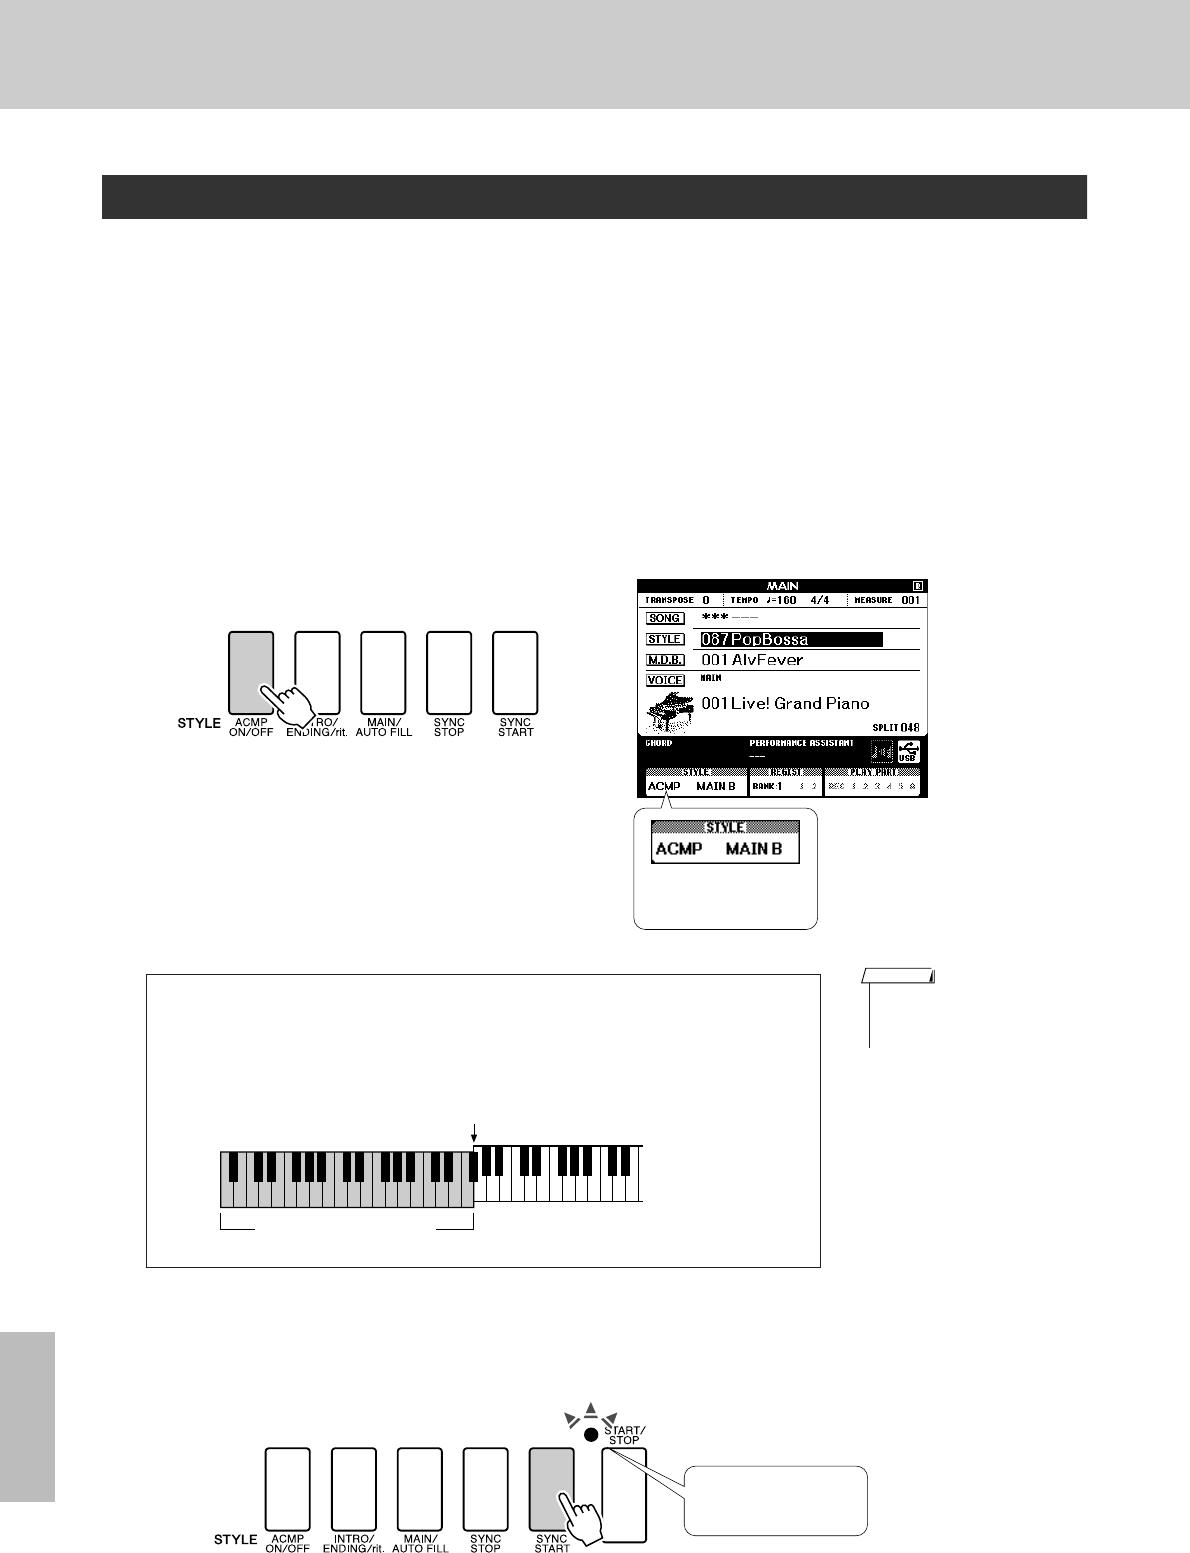 Yamaha DGX 620 520 YPG 625 525 Owner's Manual Dgx620 Es